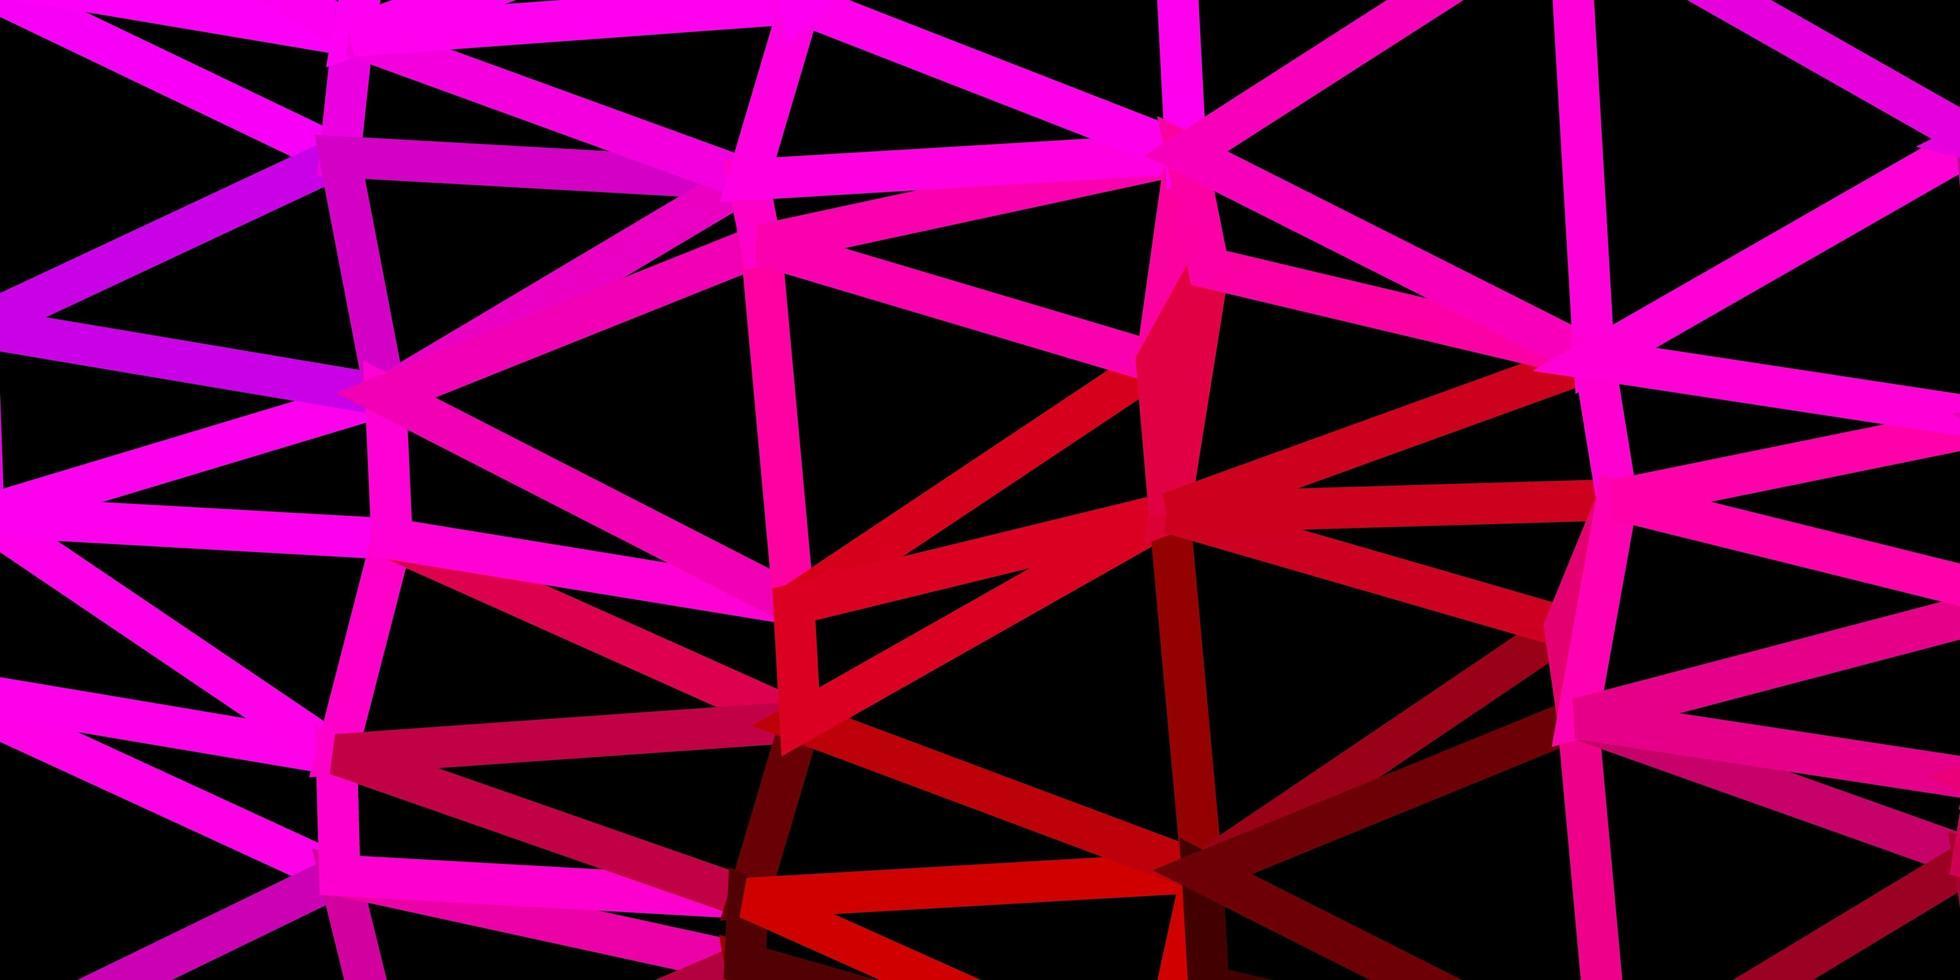 dunkelrosa Vektordreieck-Mosaikentwurf. vektor